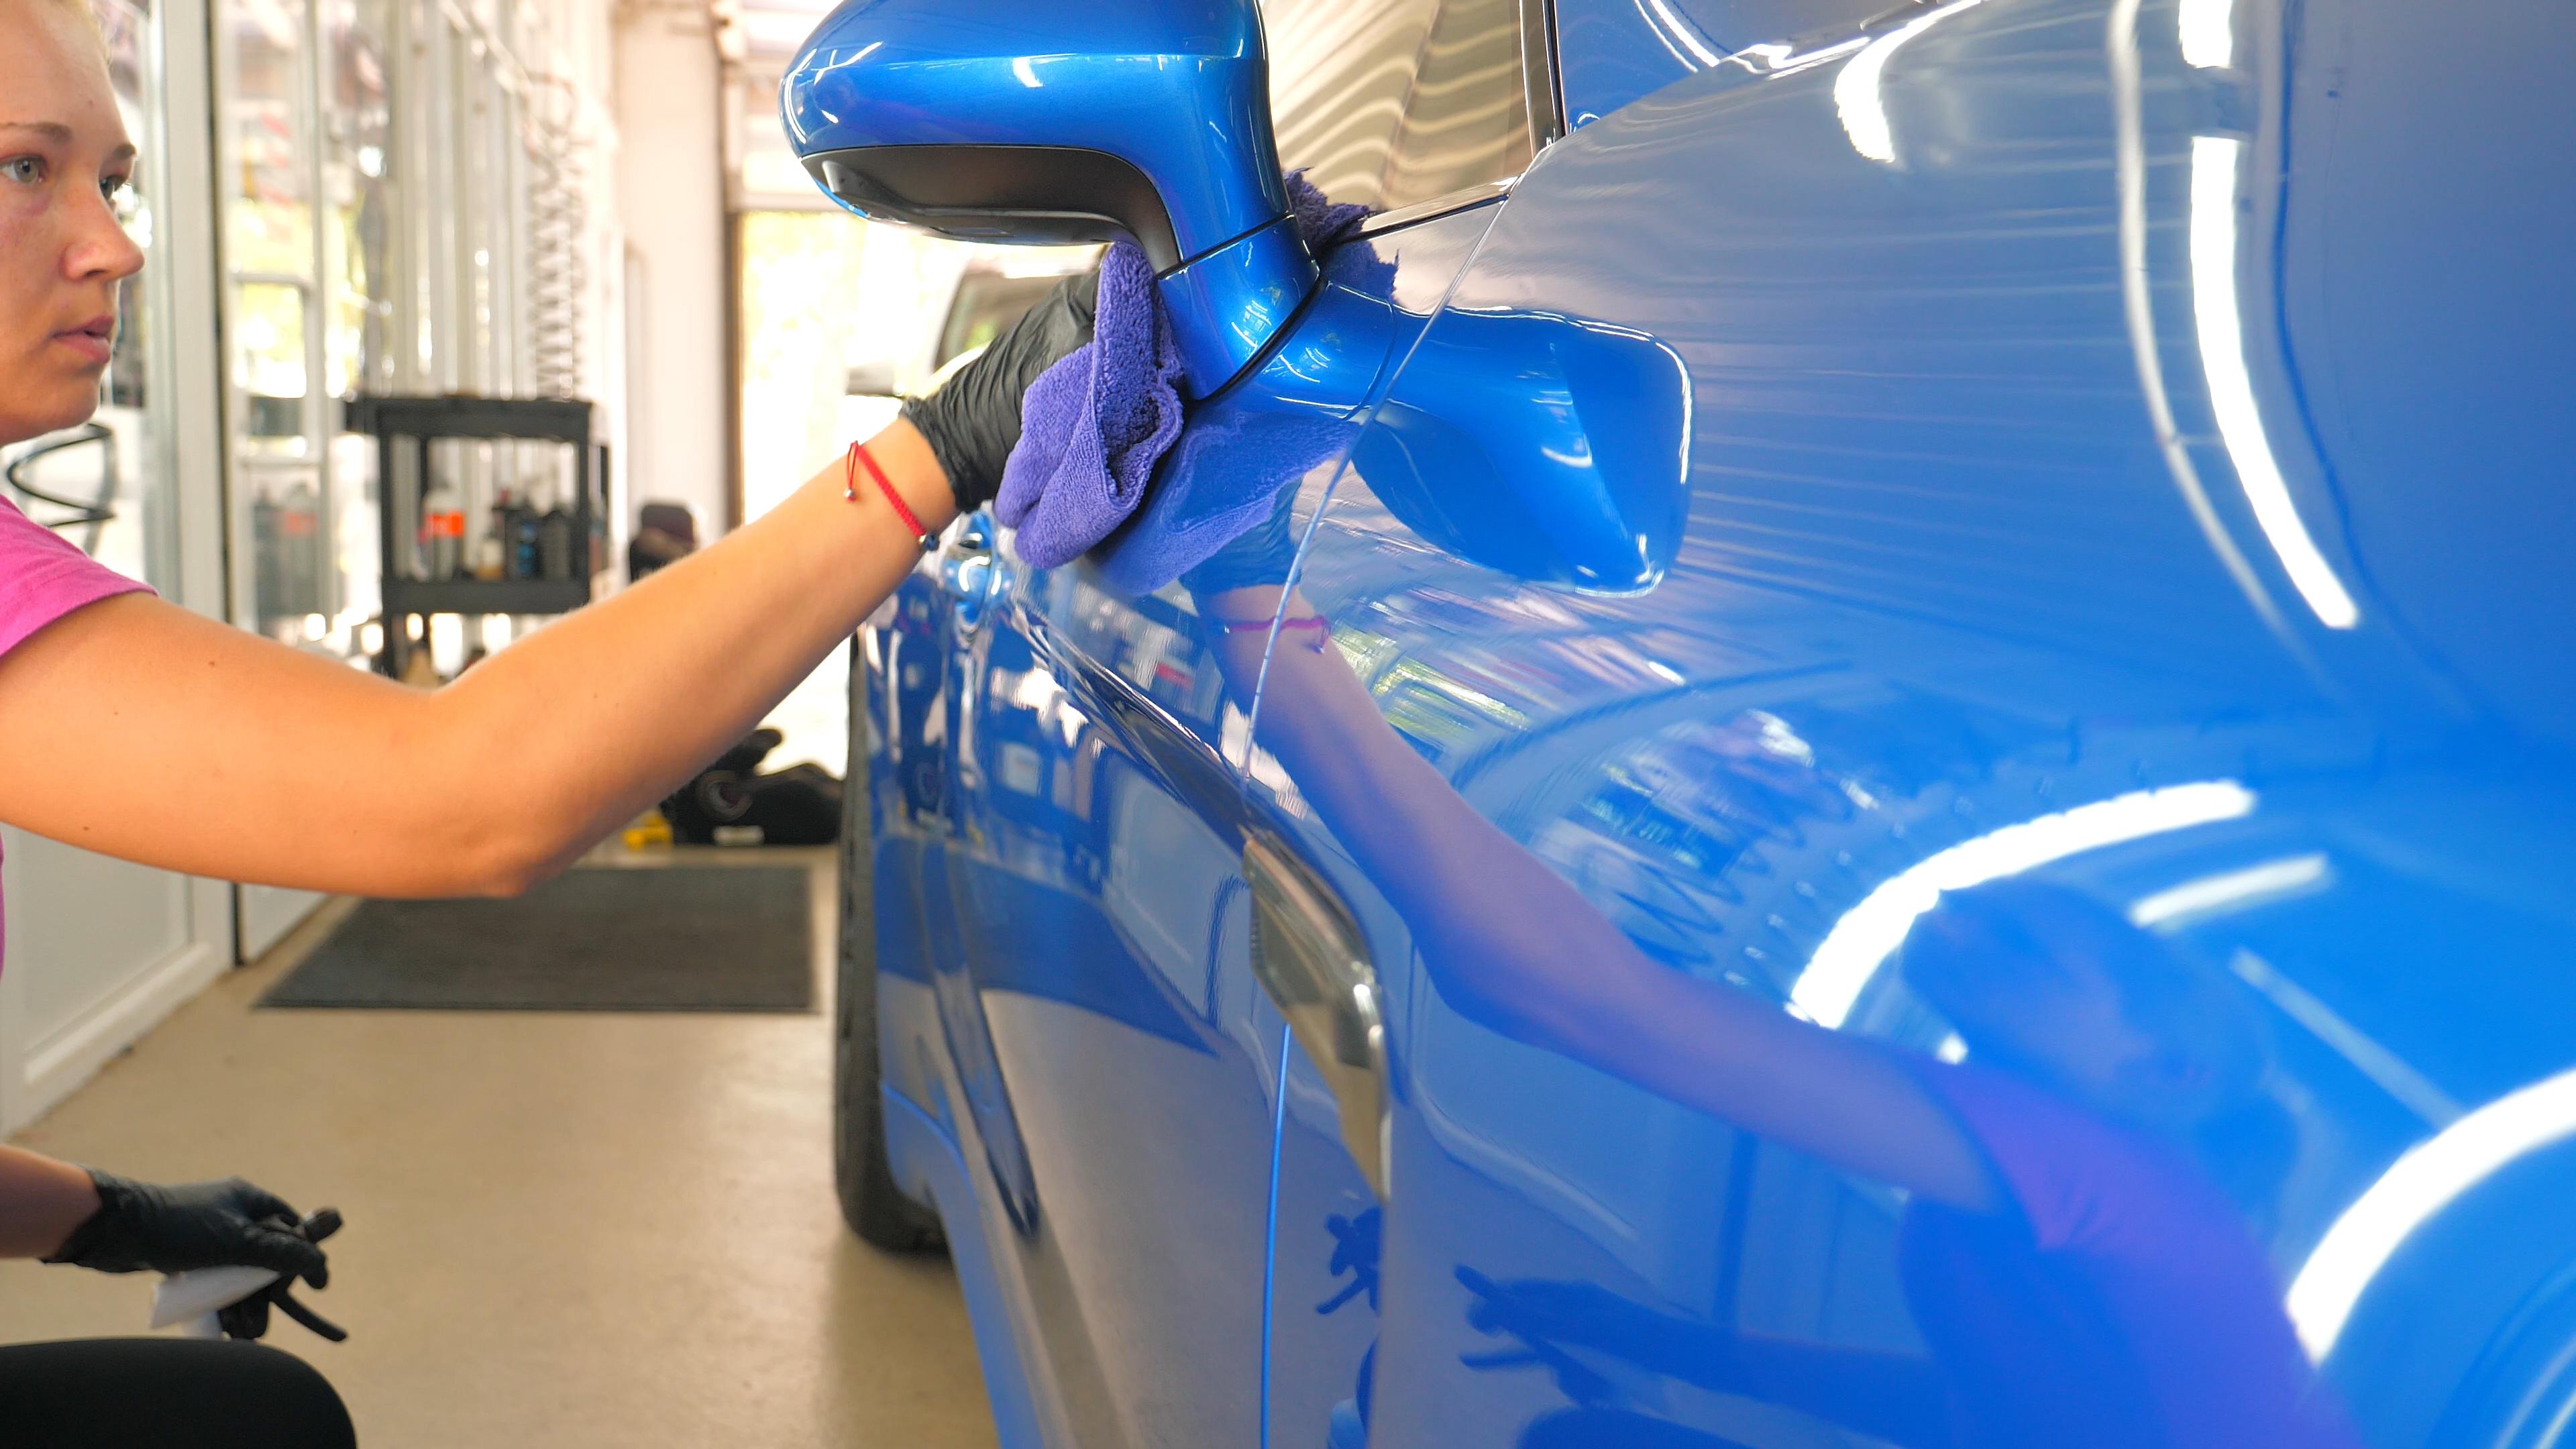 BIG Full Service Car Wash & Property